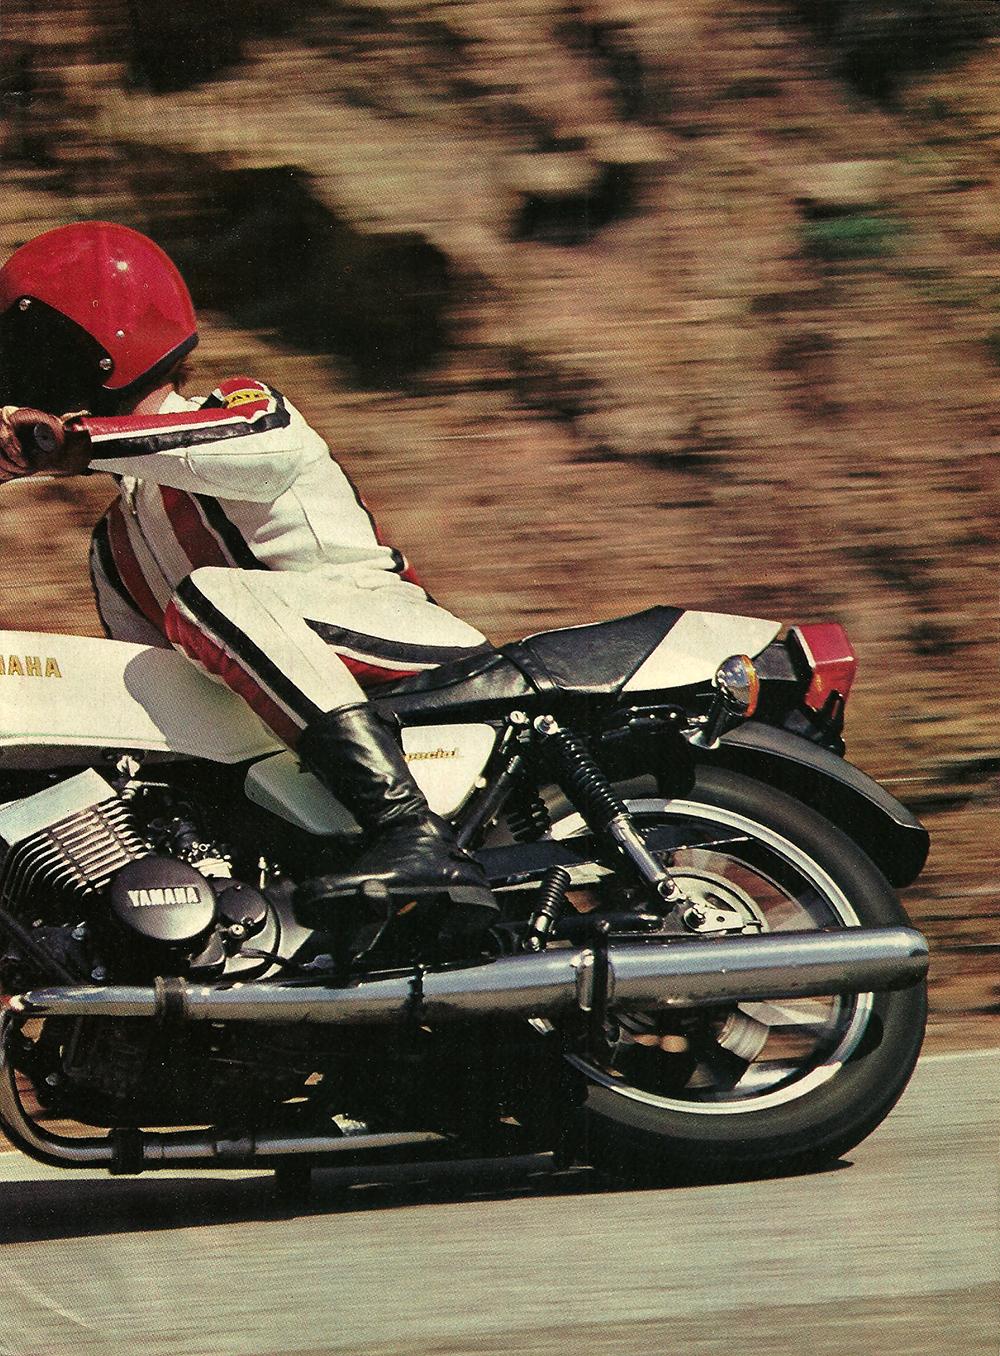 1979 Yamaha RD400F road test 02.jpg